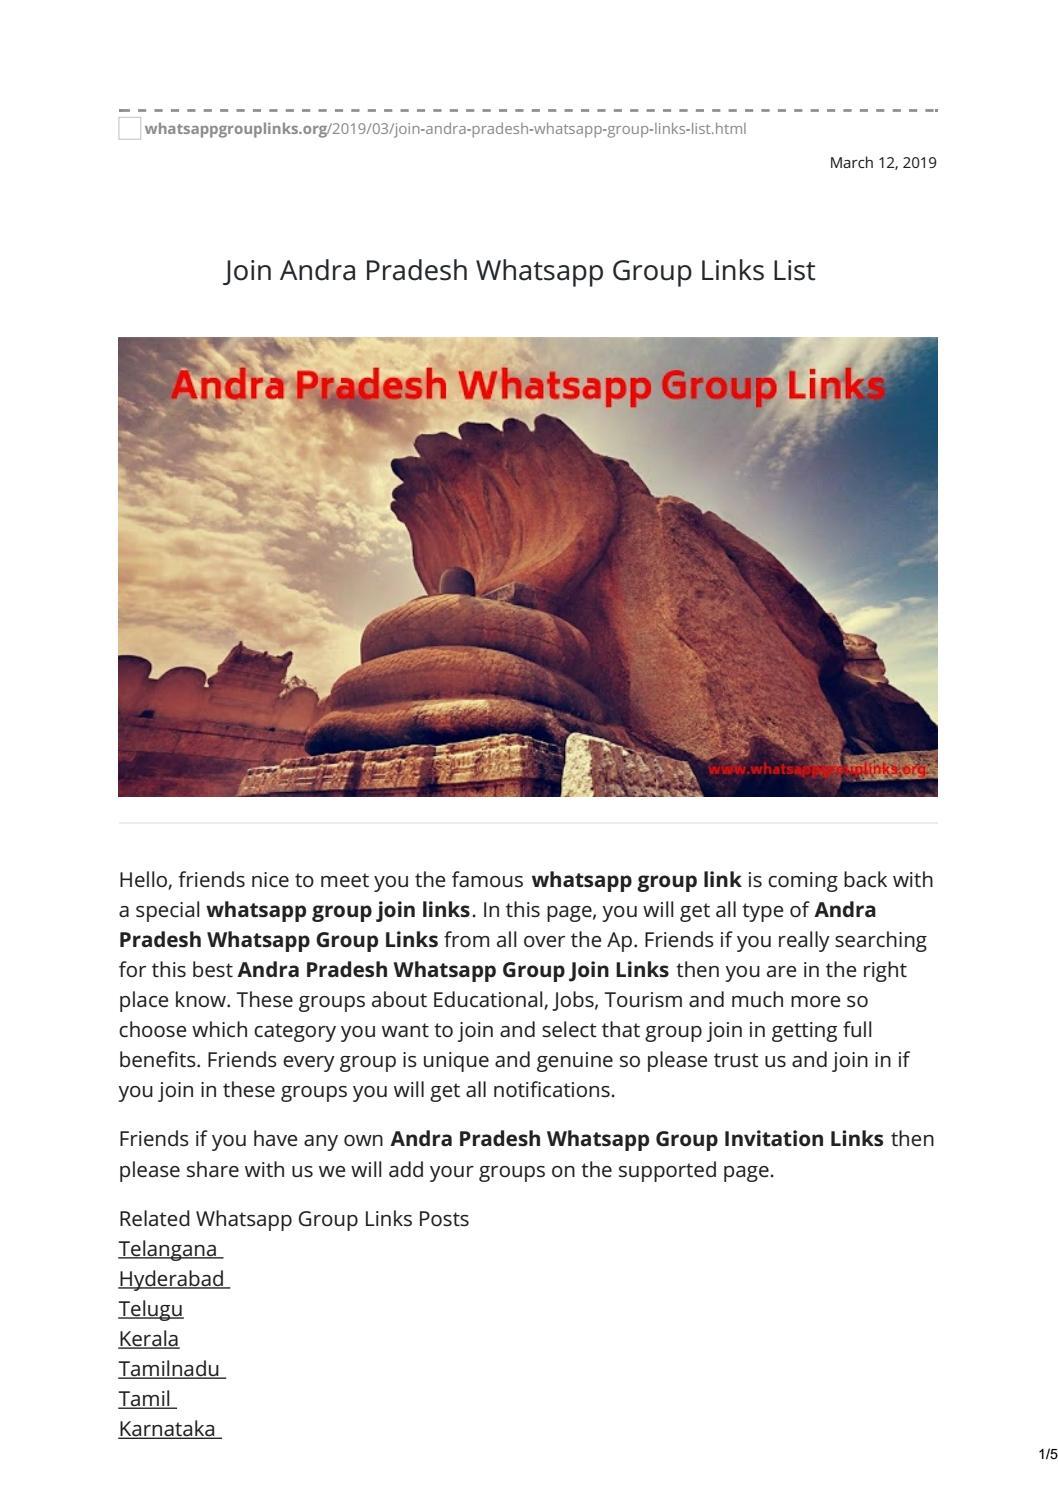 Join Andra Pradesh Whatsapp Group Links List by whatsapp group links